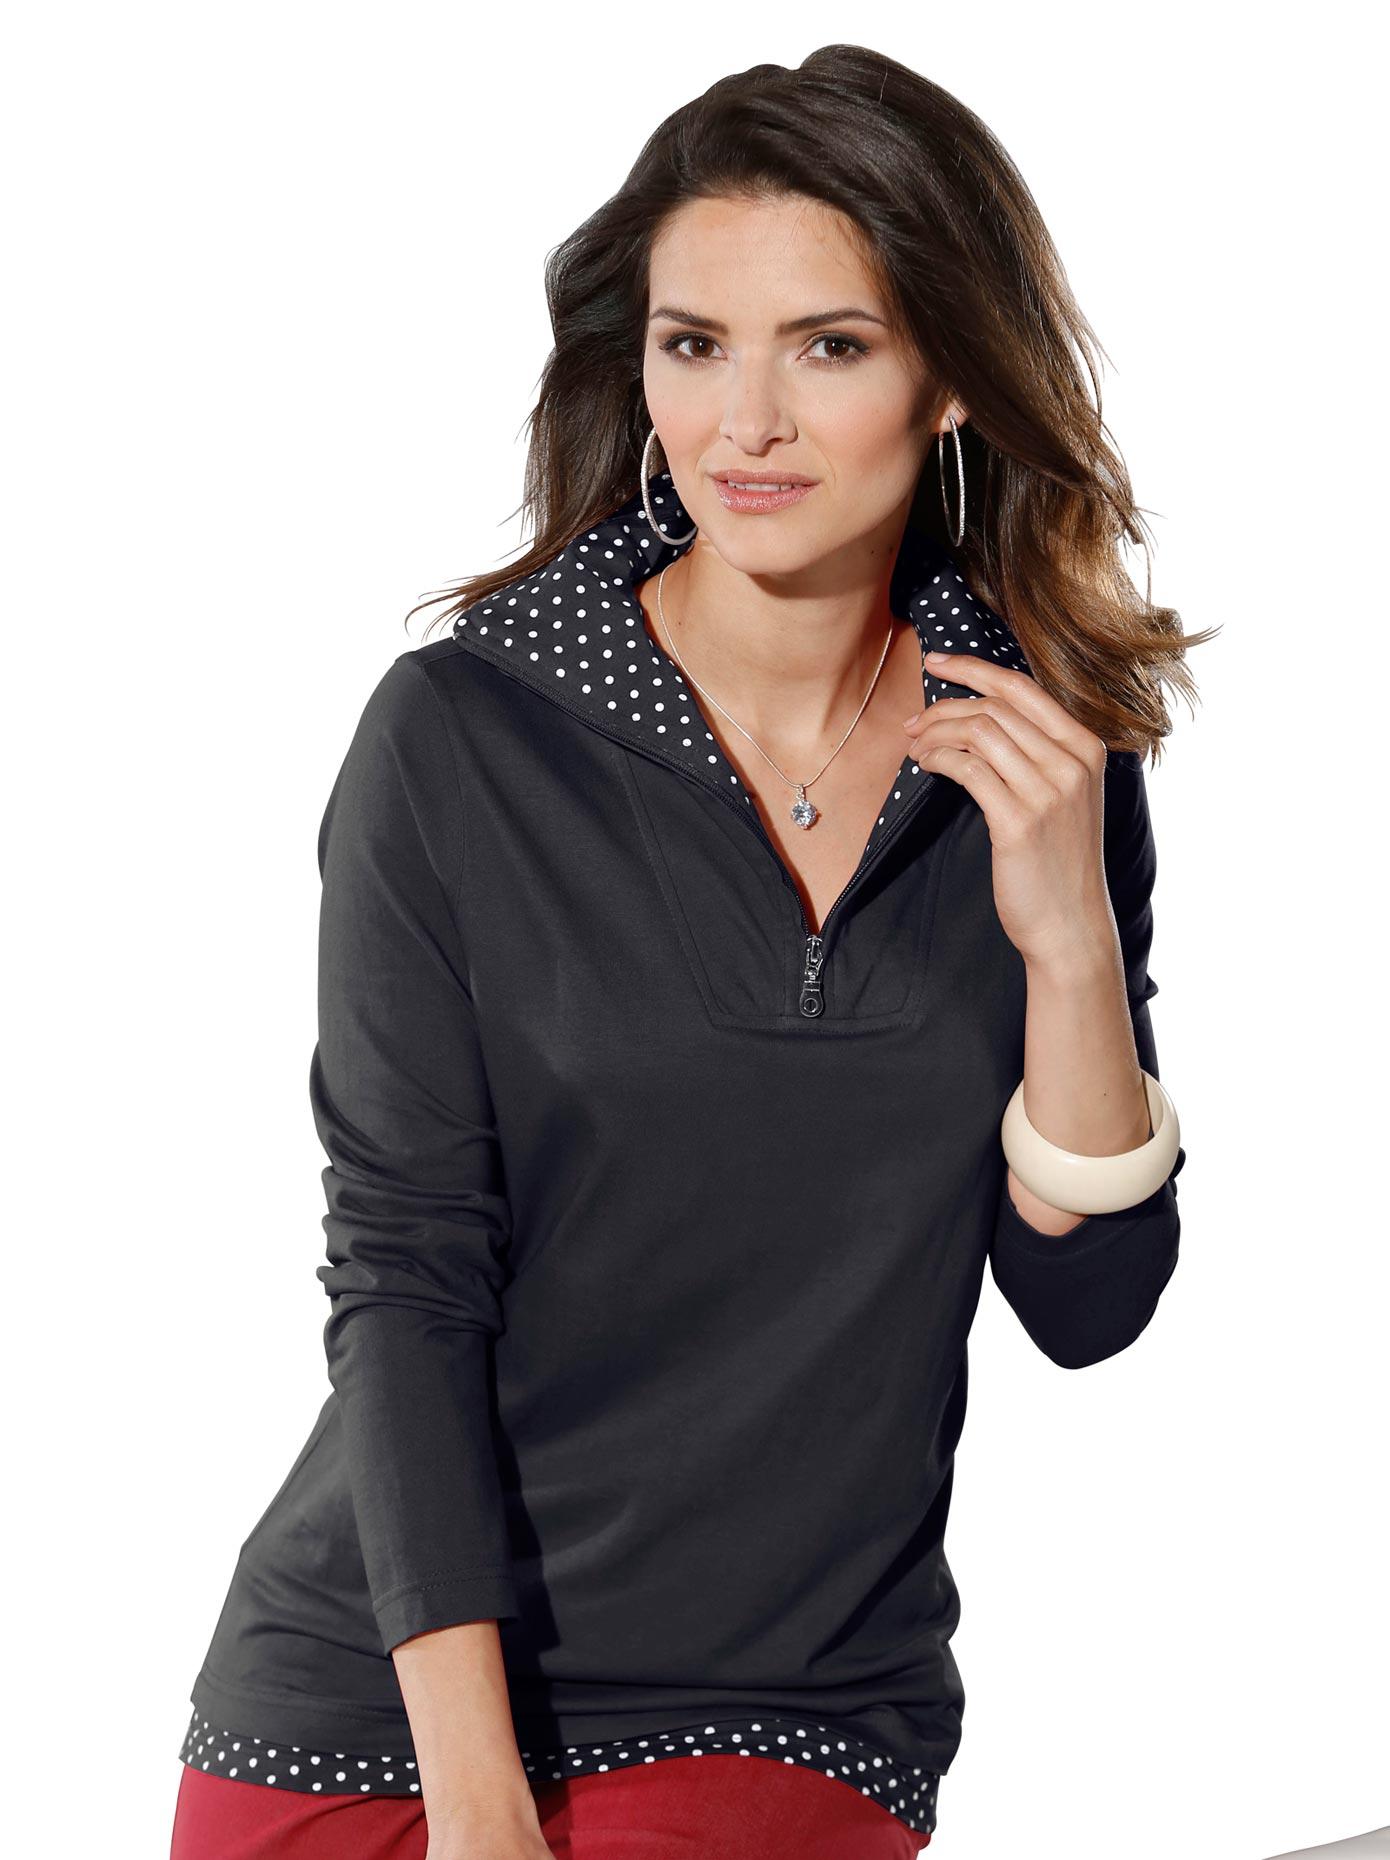 Classic Basics 2-in-1-Shirt mit Tupfendessin | Bekleidung > Shirts > 2-in-1 Shirts | Classic Basics